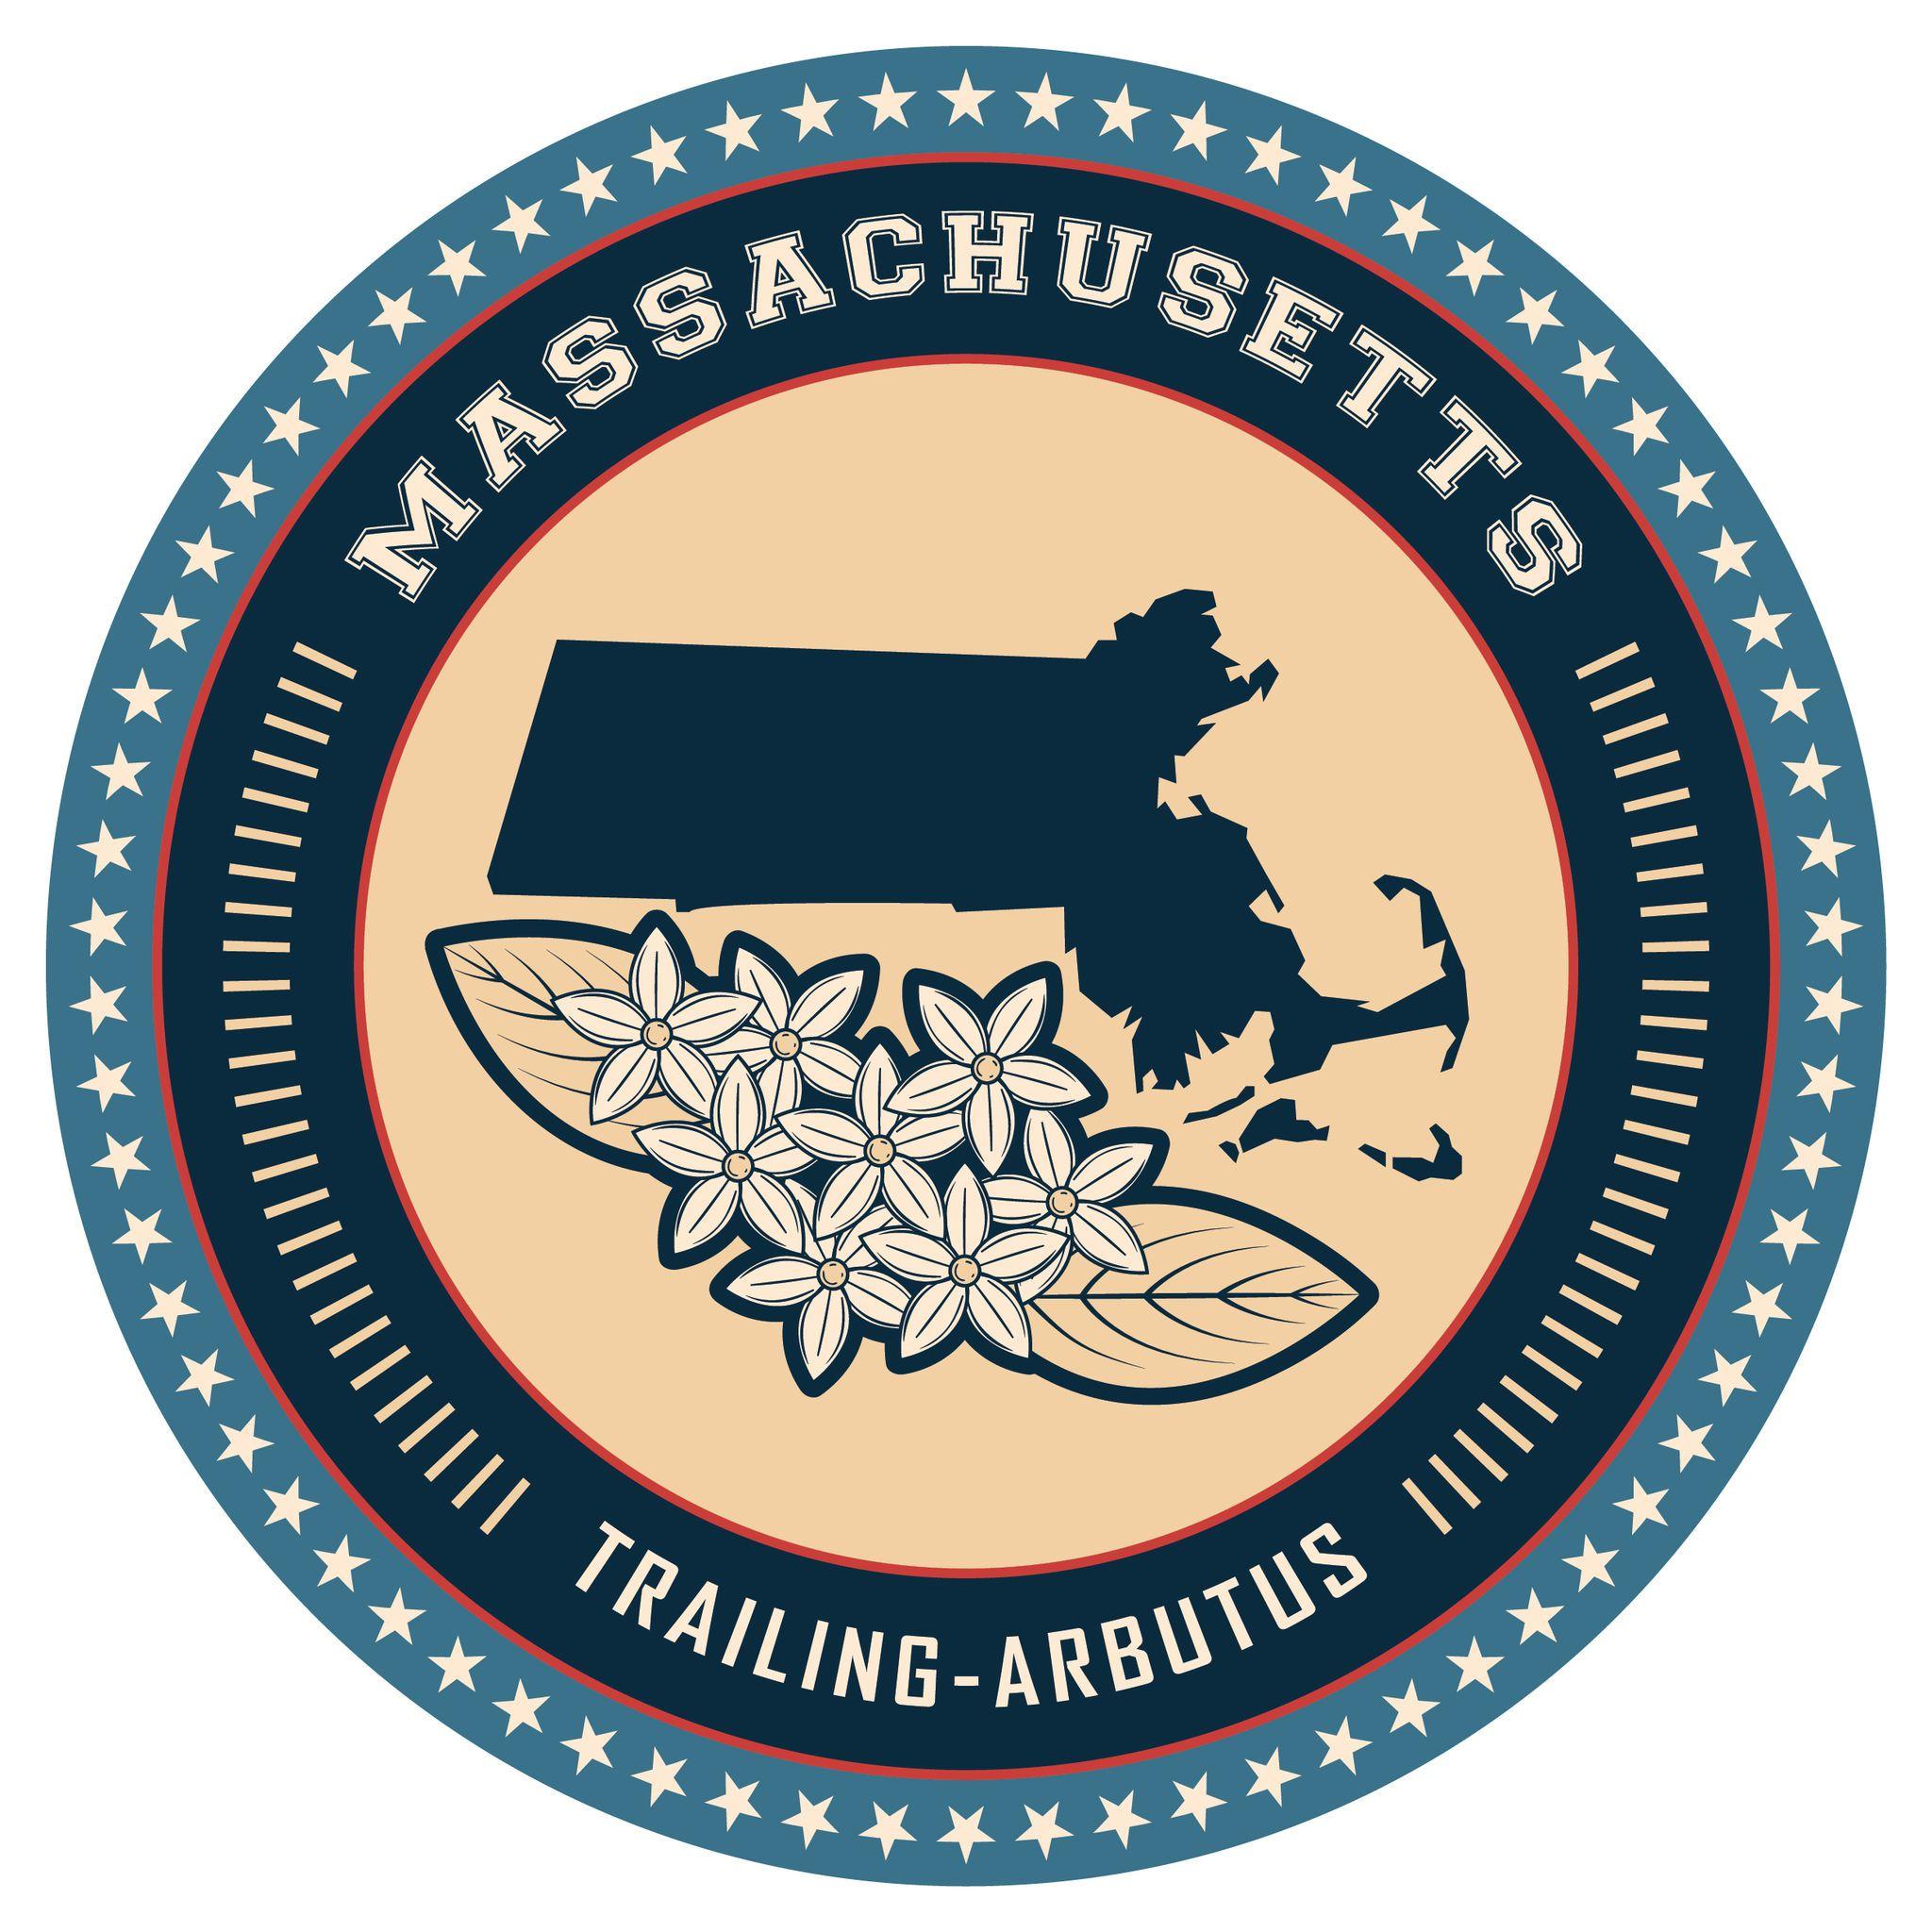 Massachusetts Sets New Rules That Limit Energy Use By Marijuana